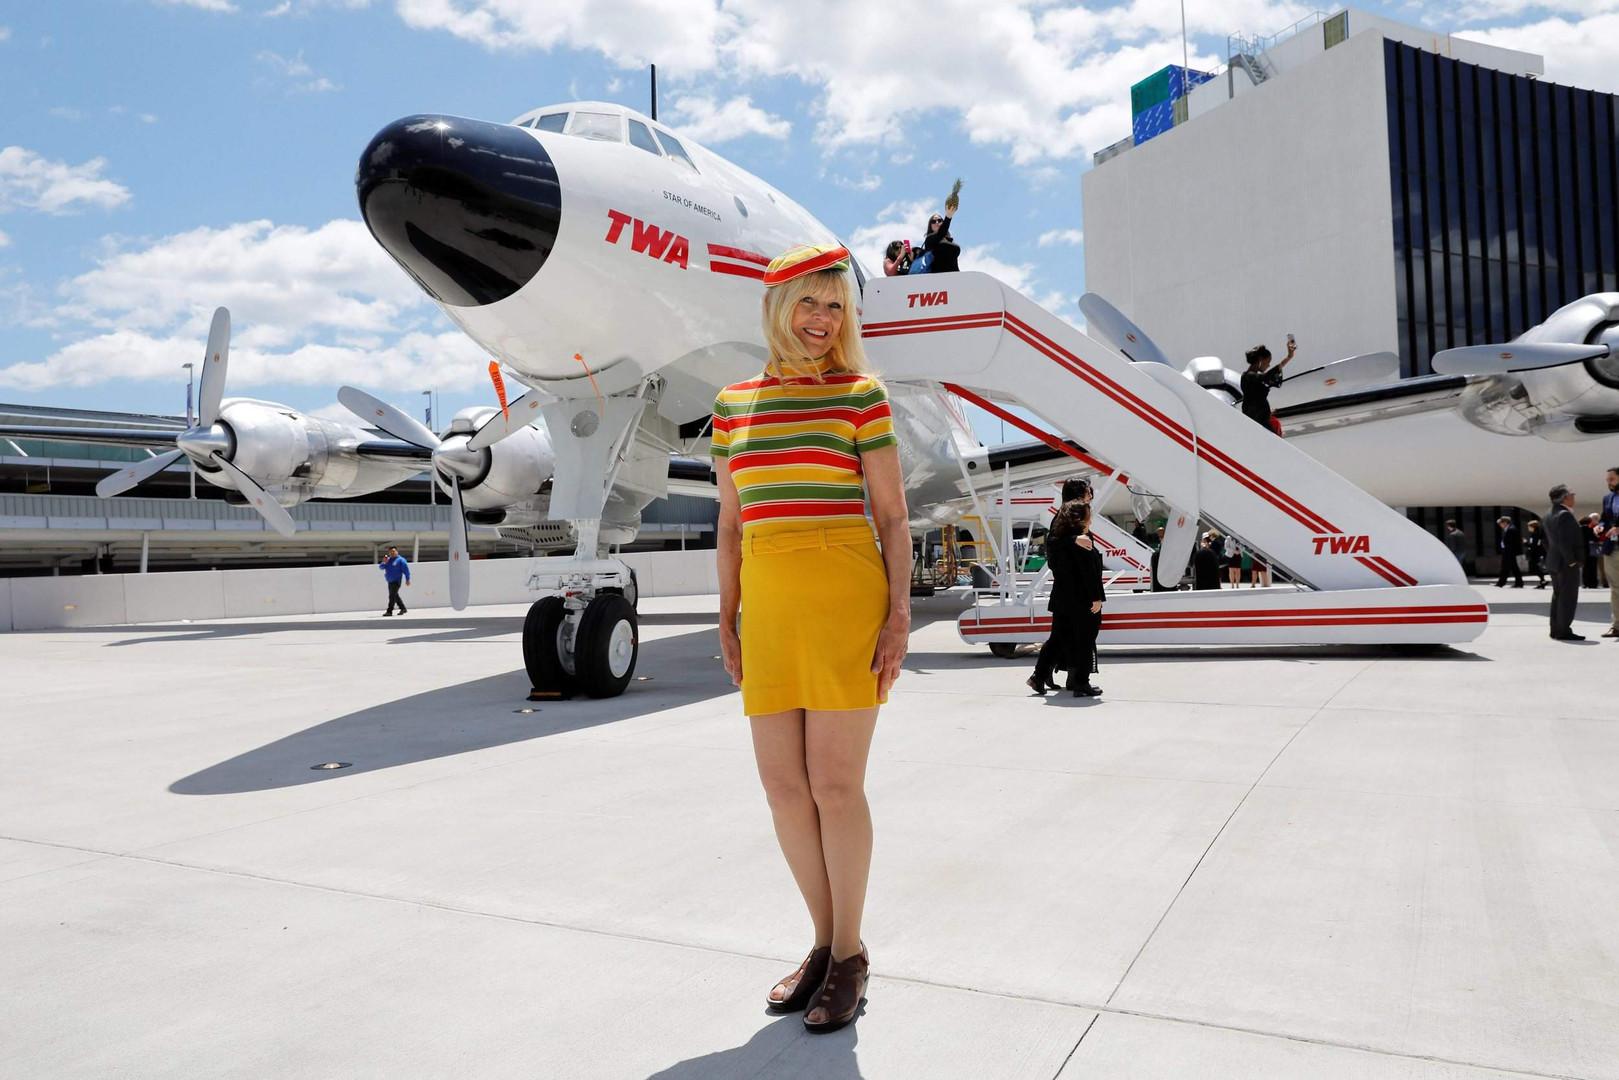 TWA Connie Cocktail Server Uniform